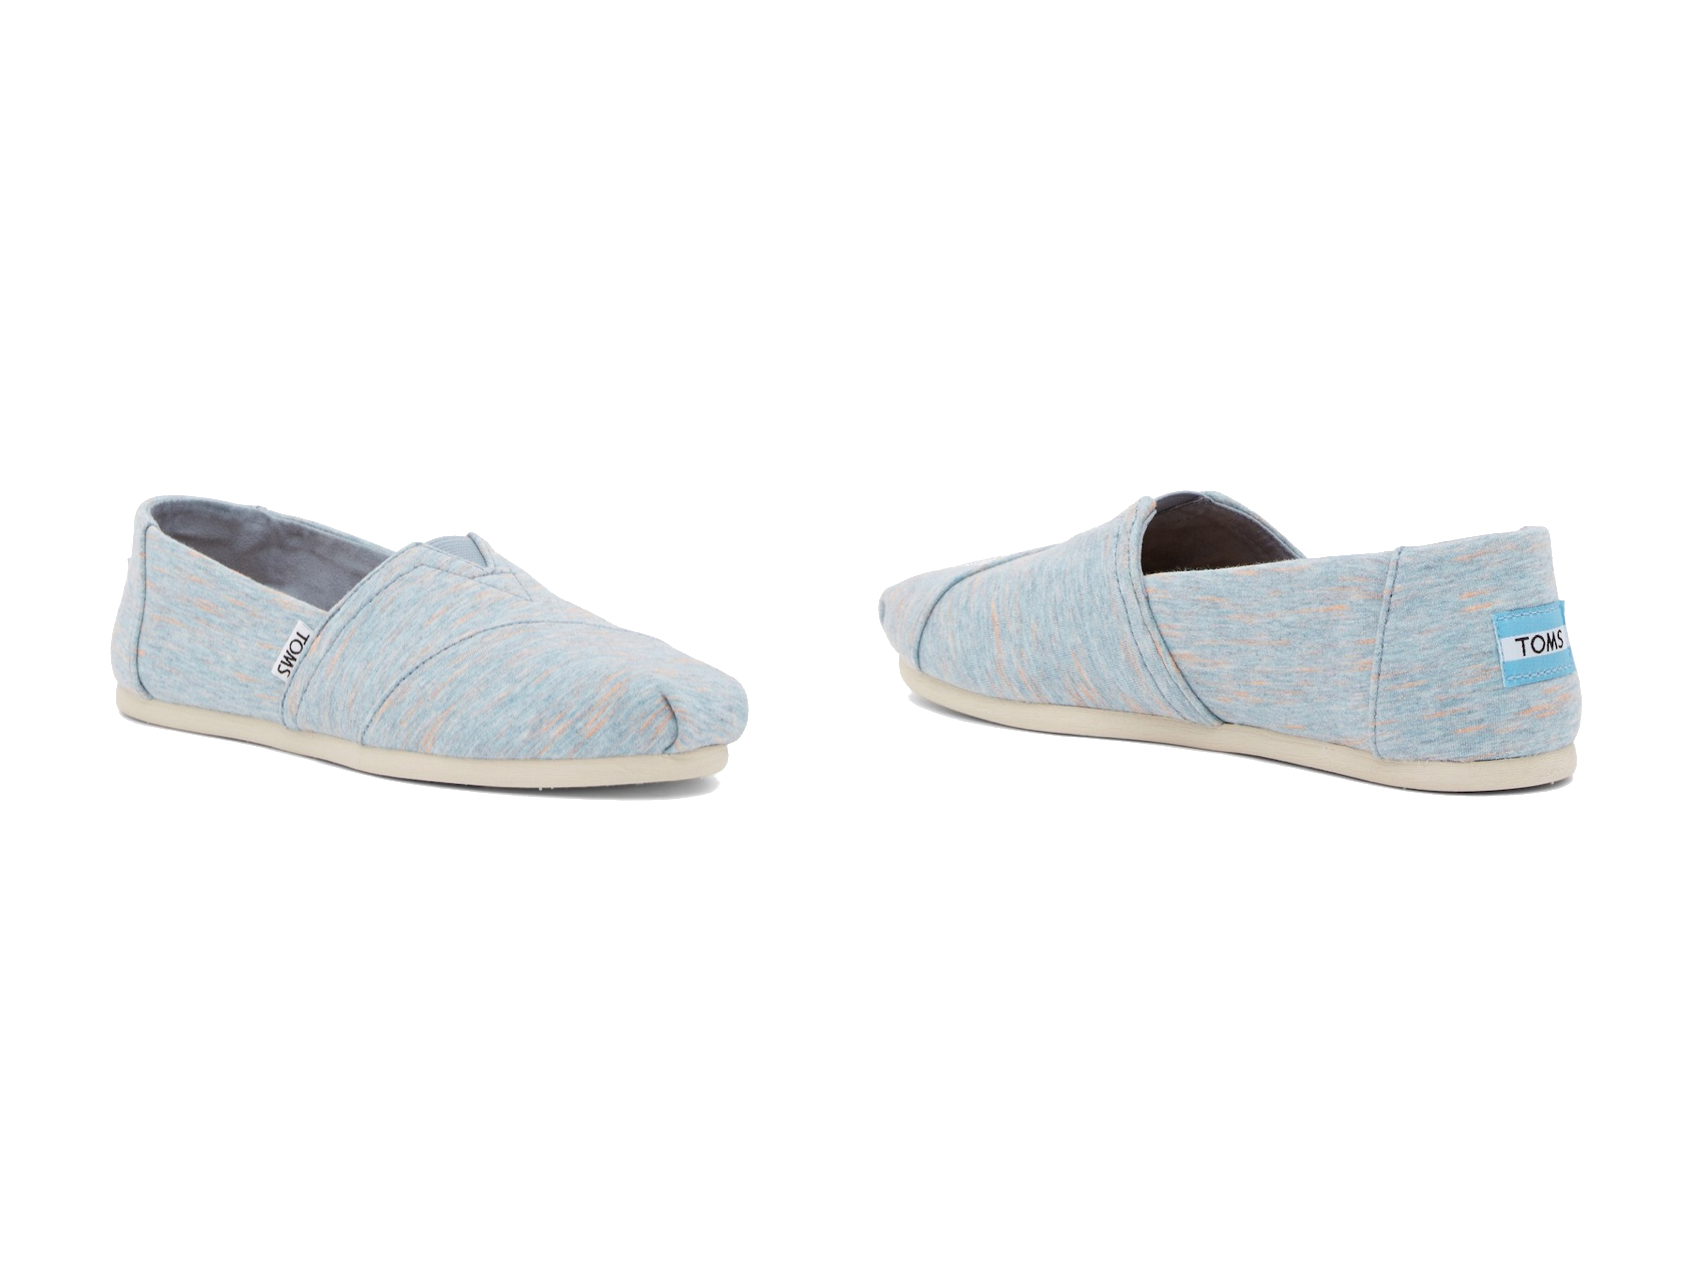 TOMS Shoes Sale: Best Slip-On Shoes